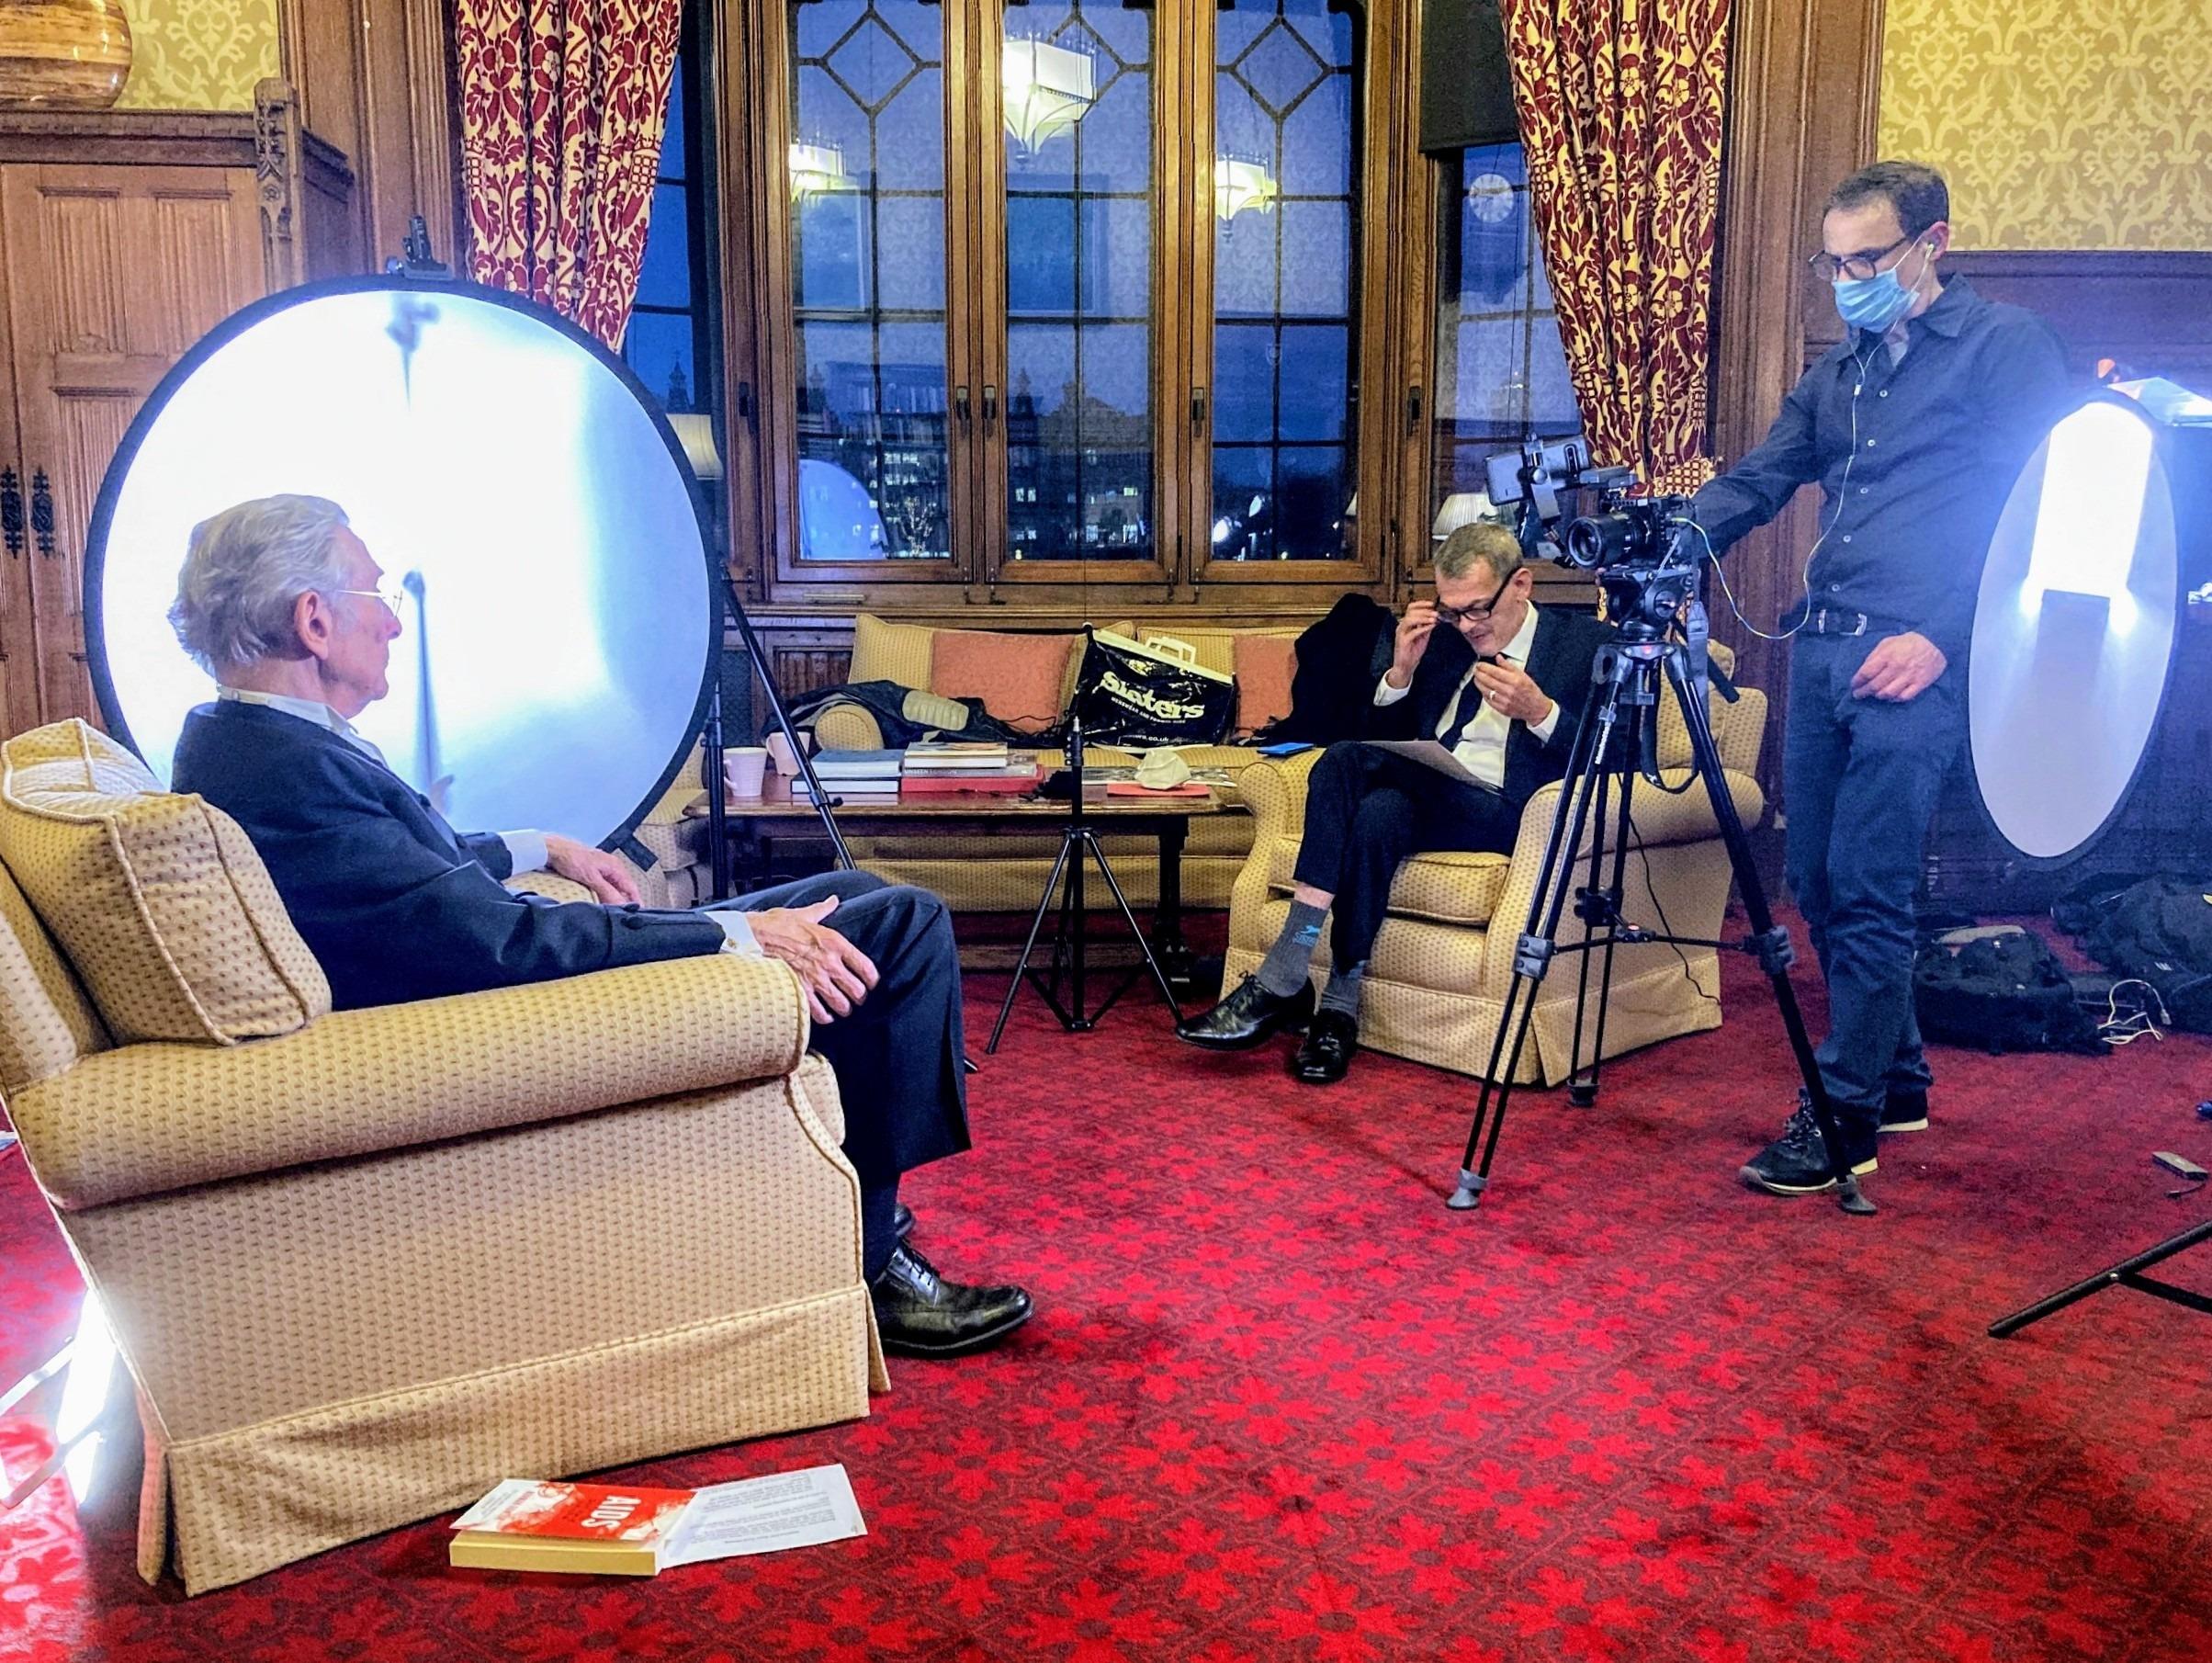 BBC News: NHST interviews Lord Fowler, former Health Secretary